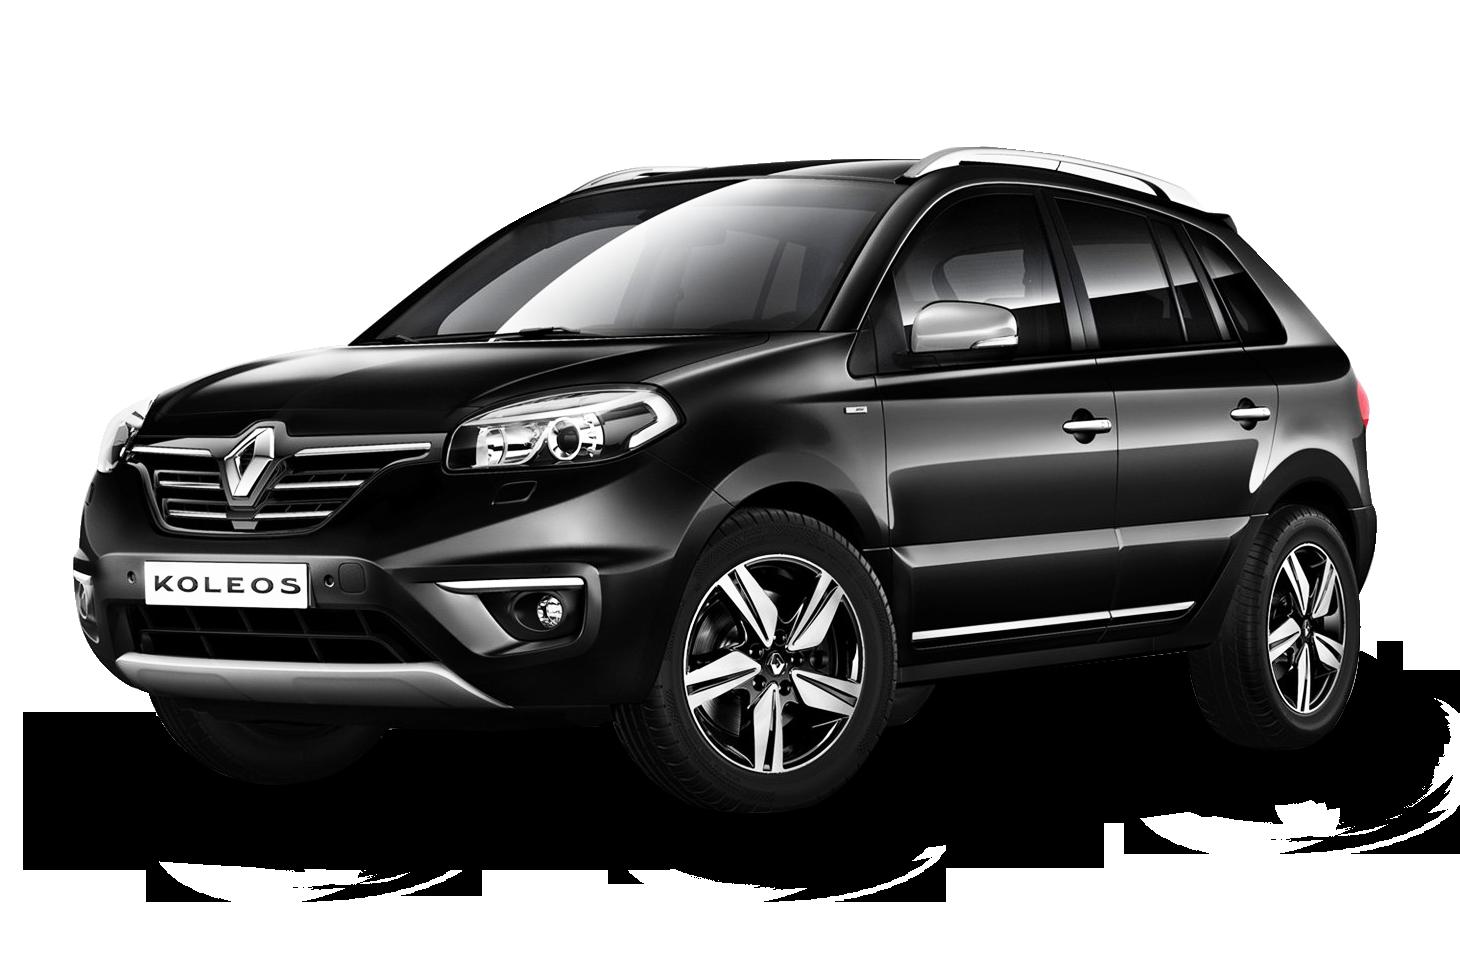 Black Renault Koleos Car PNG Image